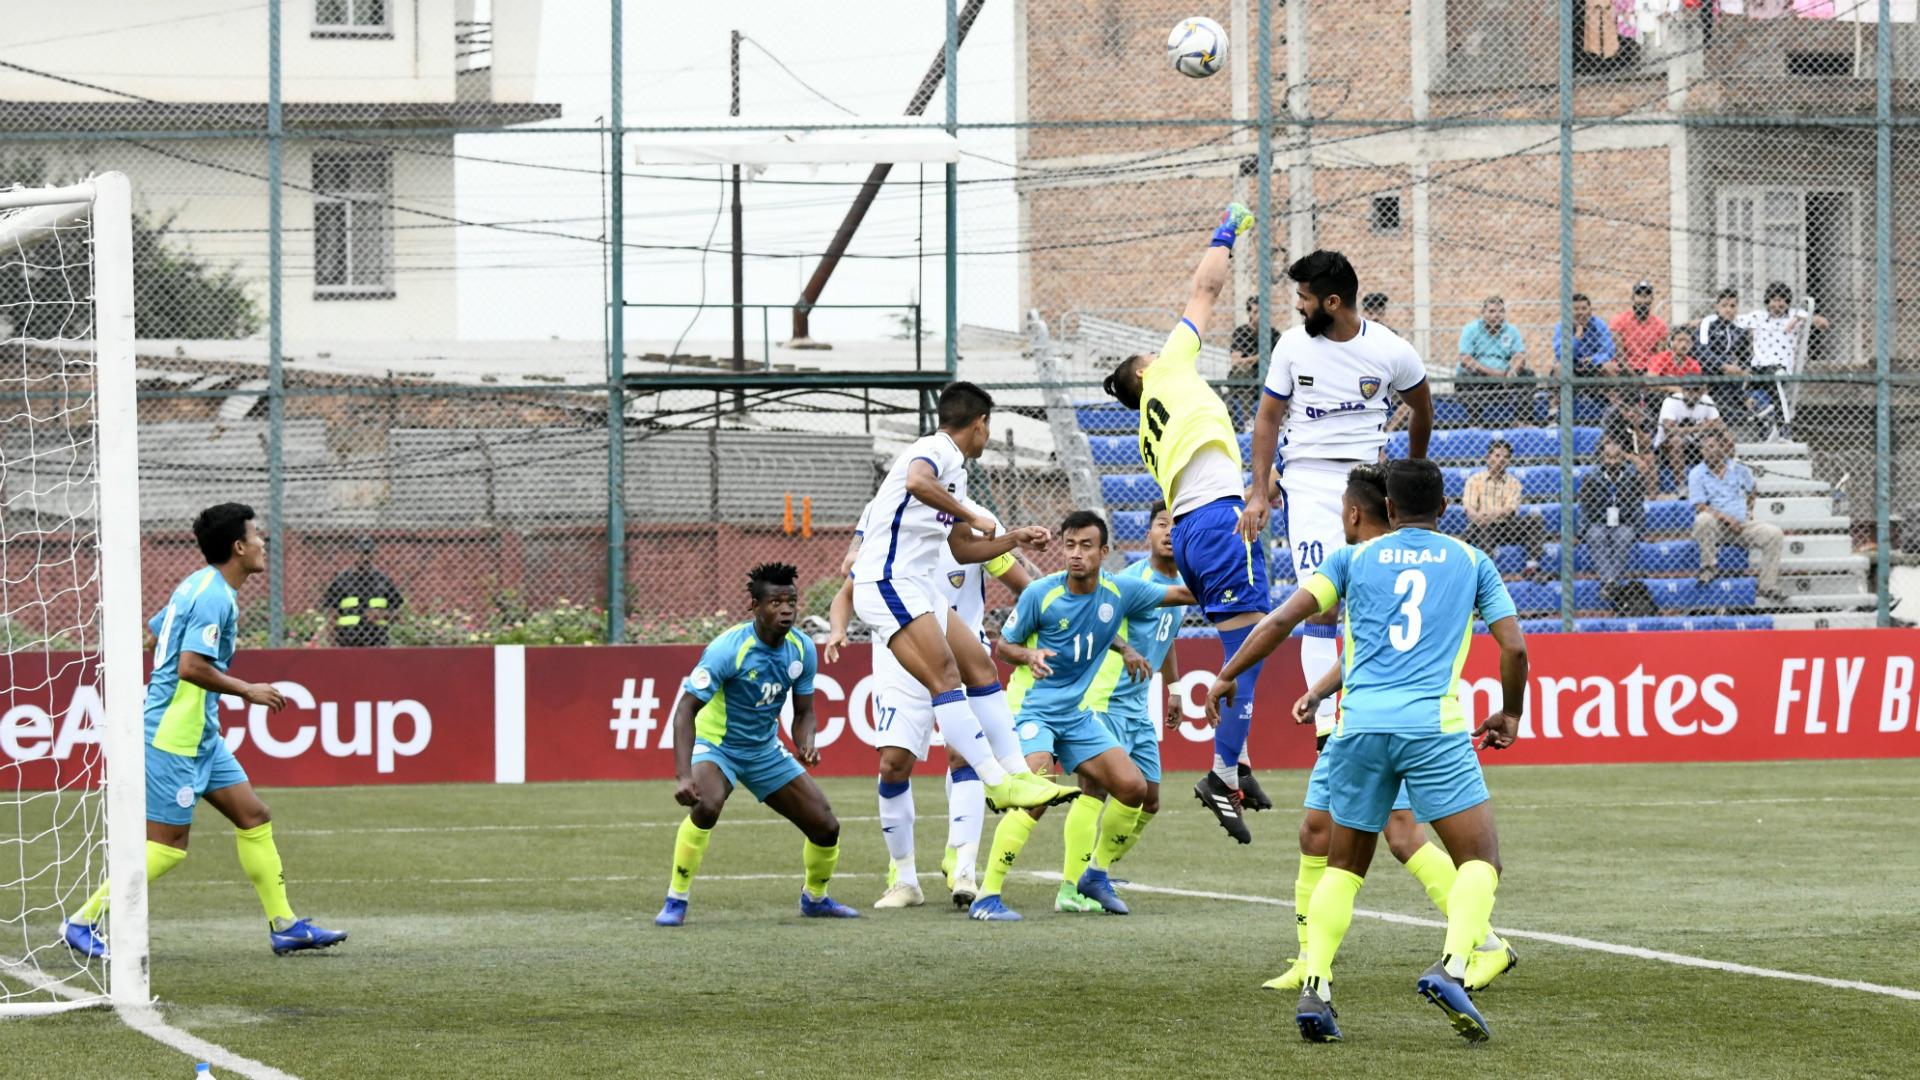 ISL 2019/20: Will Chennaiyin FC's 'gamble' on John Gregory pay off?